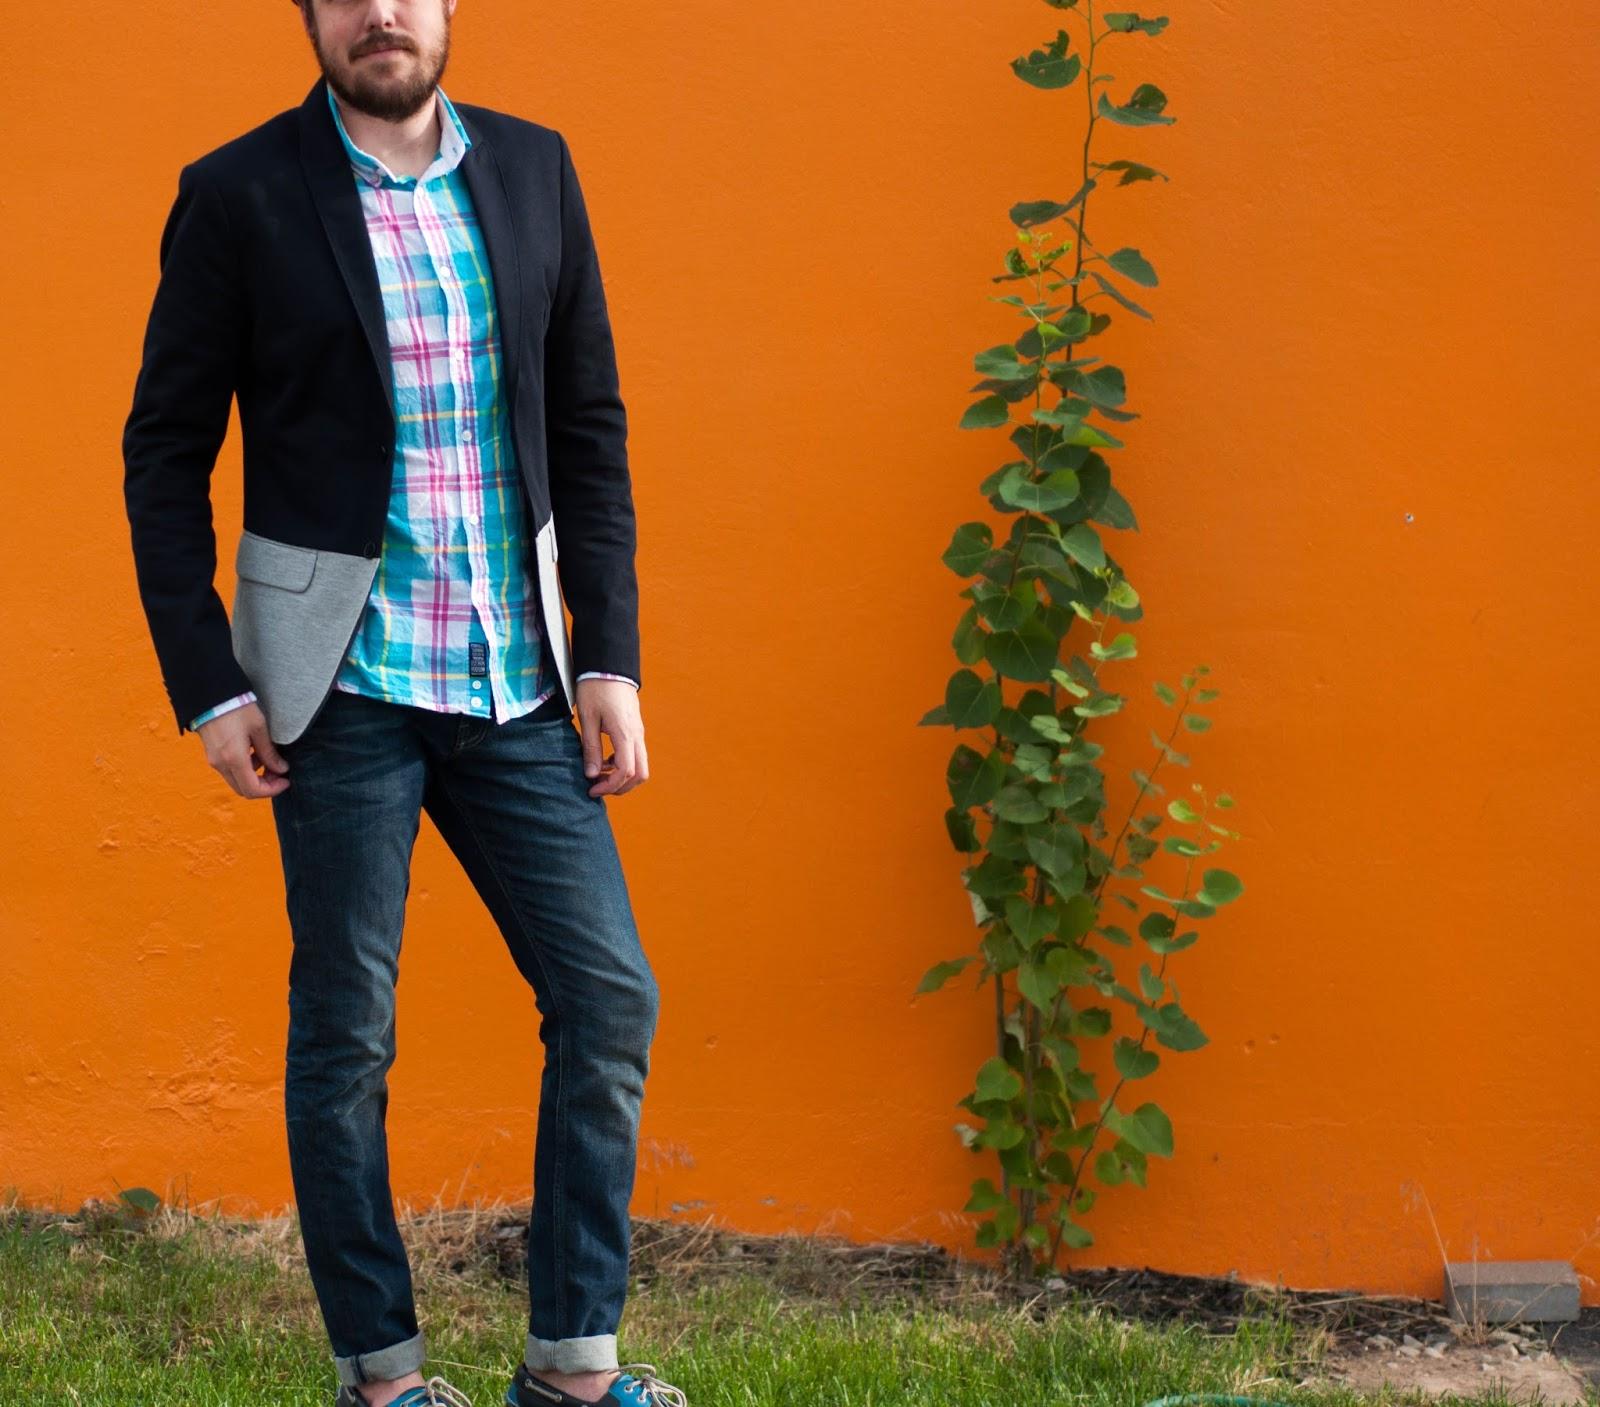 mens fashion, mens style, ootd, mens ootd, zara man, zara blazer, all saints cigarette jeans